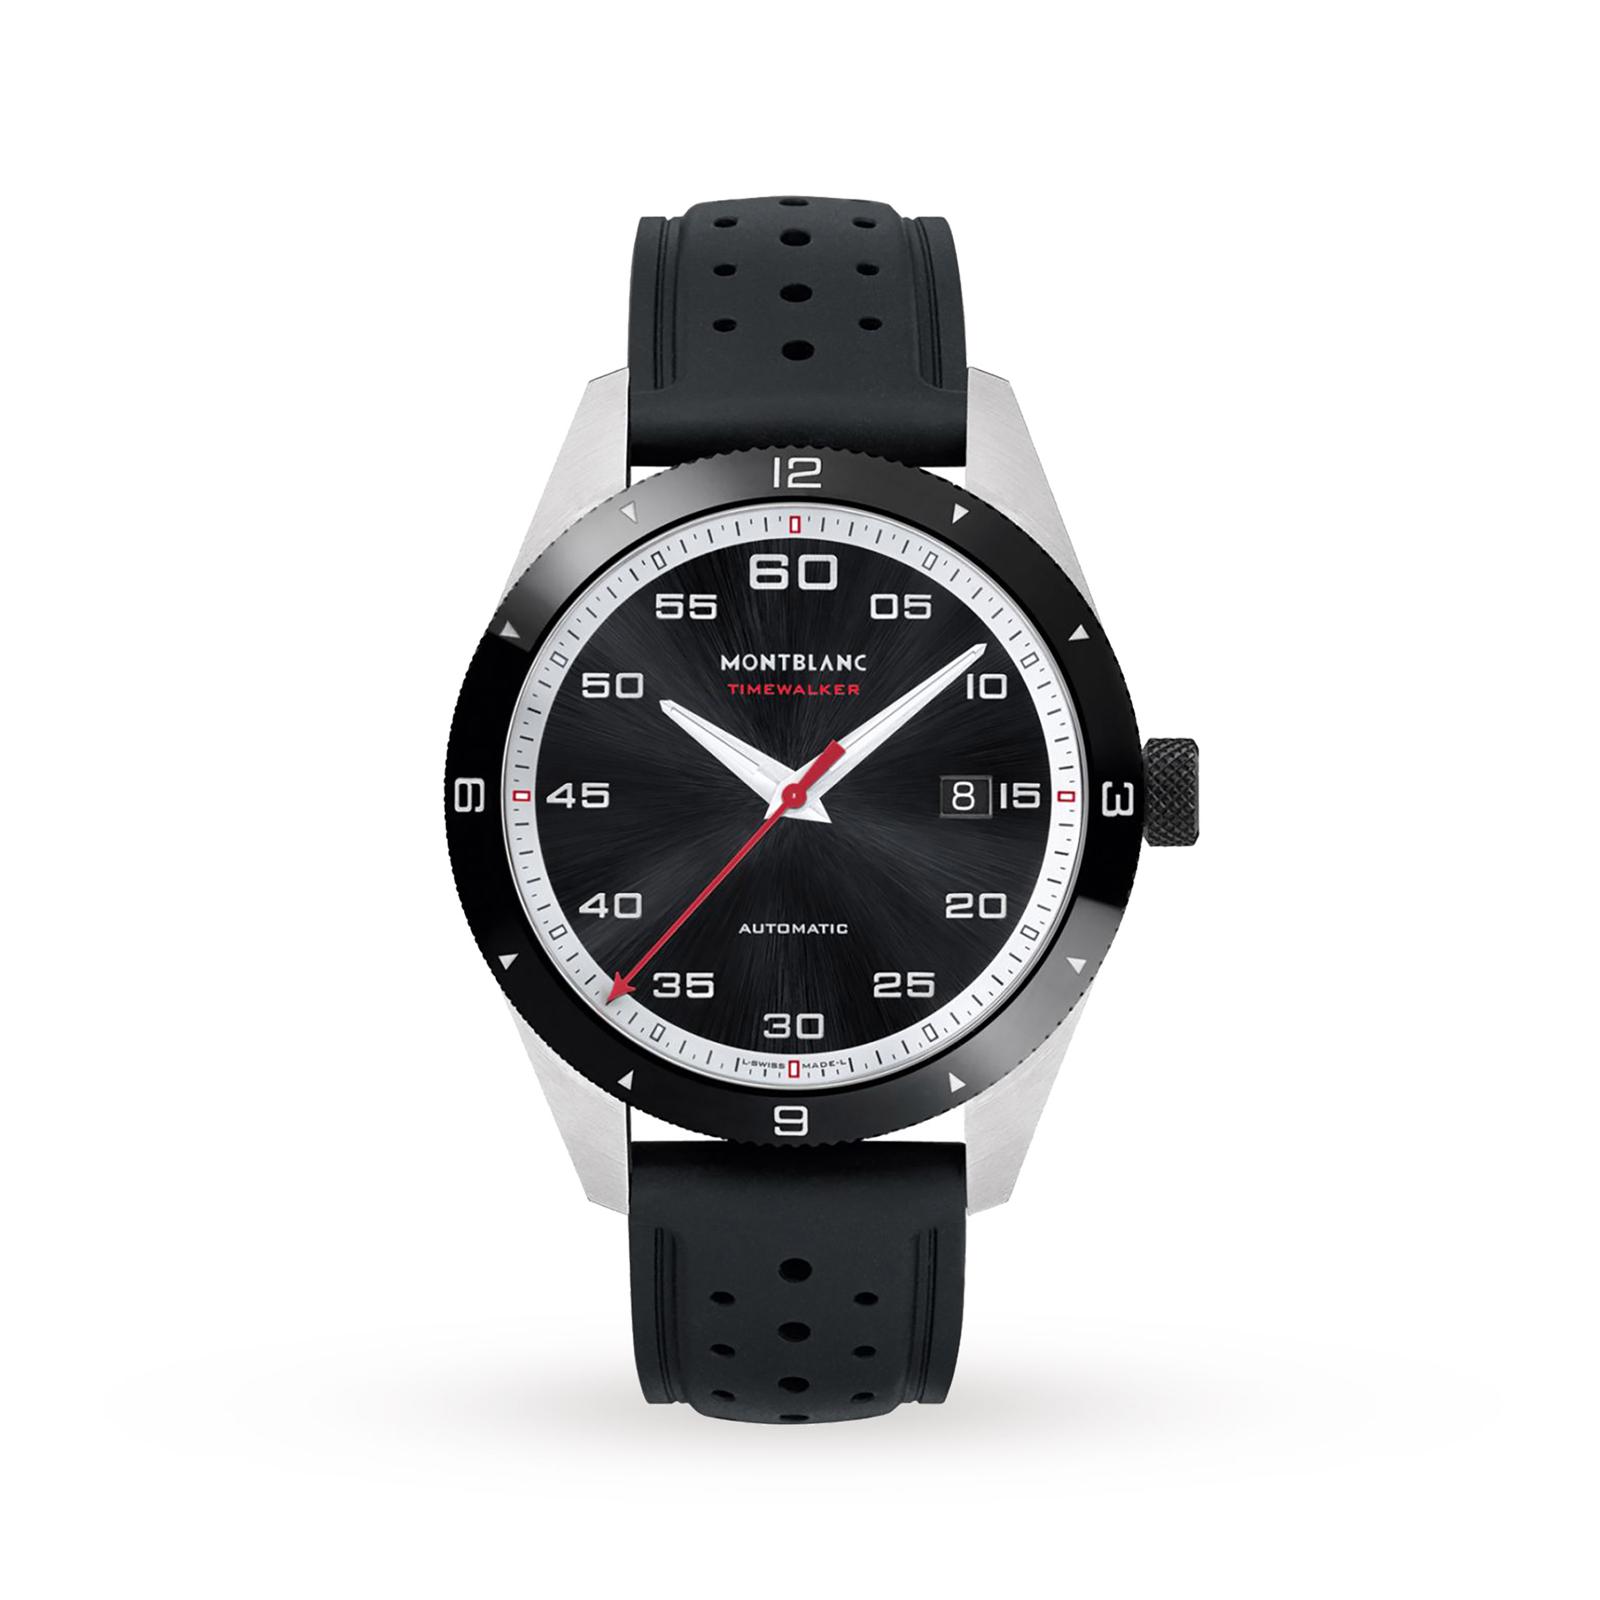 Montblanc Timewalker Automatic Watch £1230 Delivered Free @ Goldsmiths